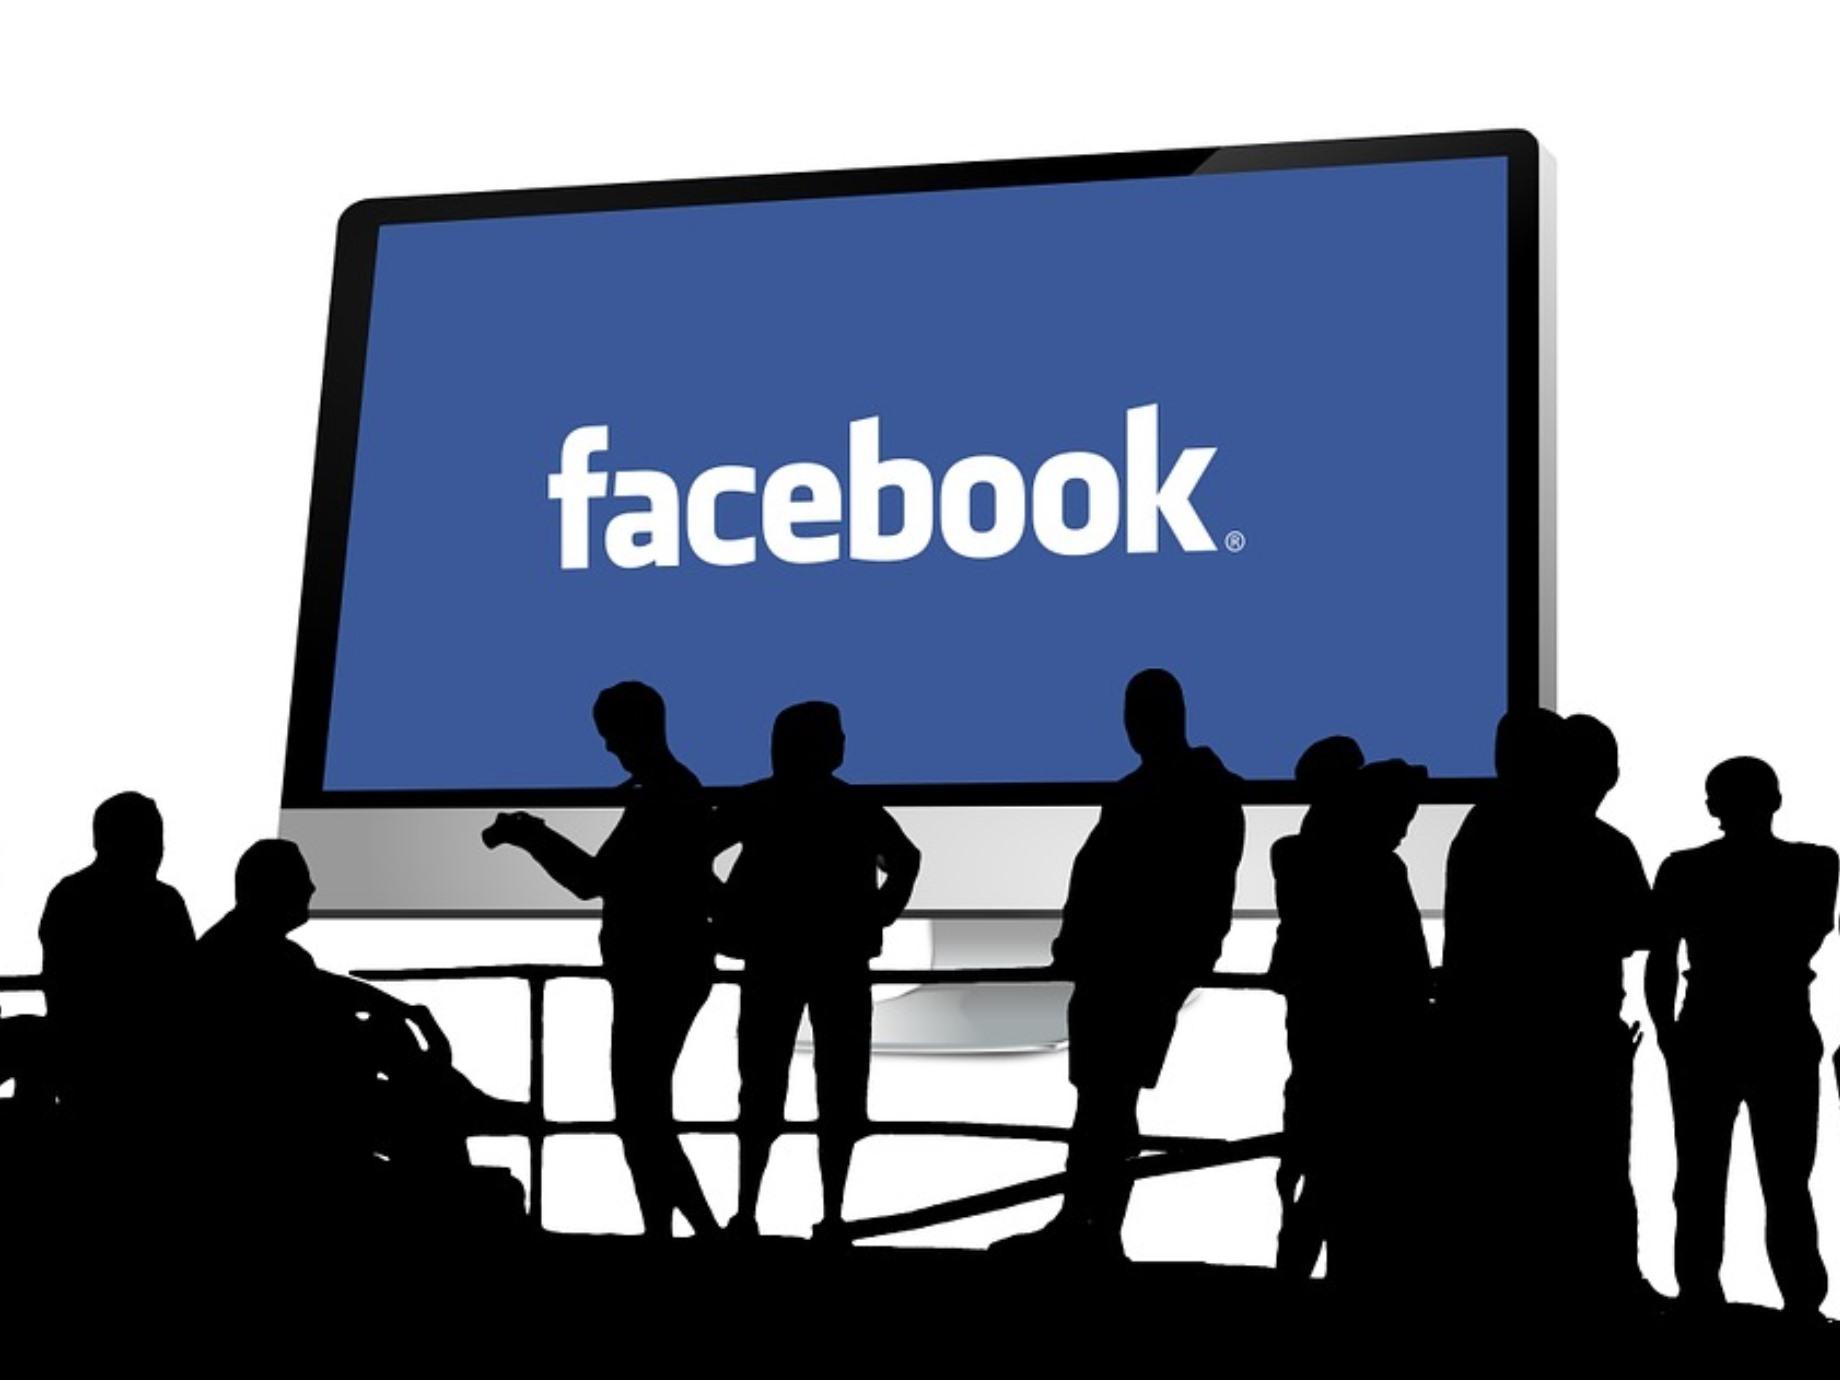 Facebook調整影音廣告策略:測試前置6秒廣告、插播間隔增長為3分鐘